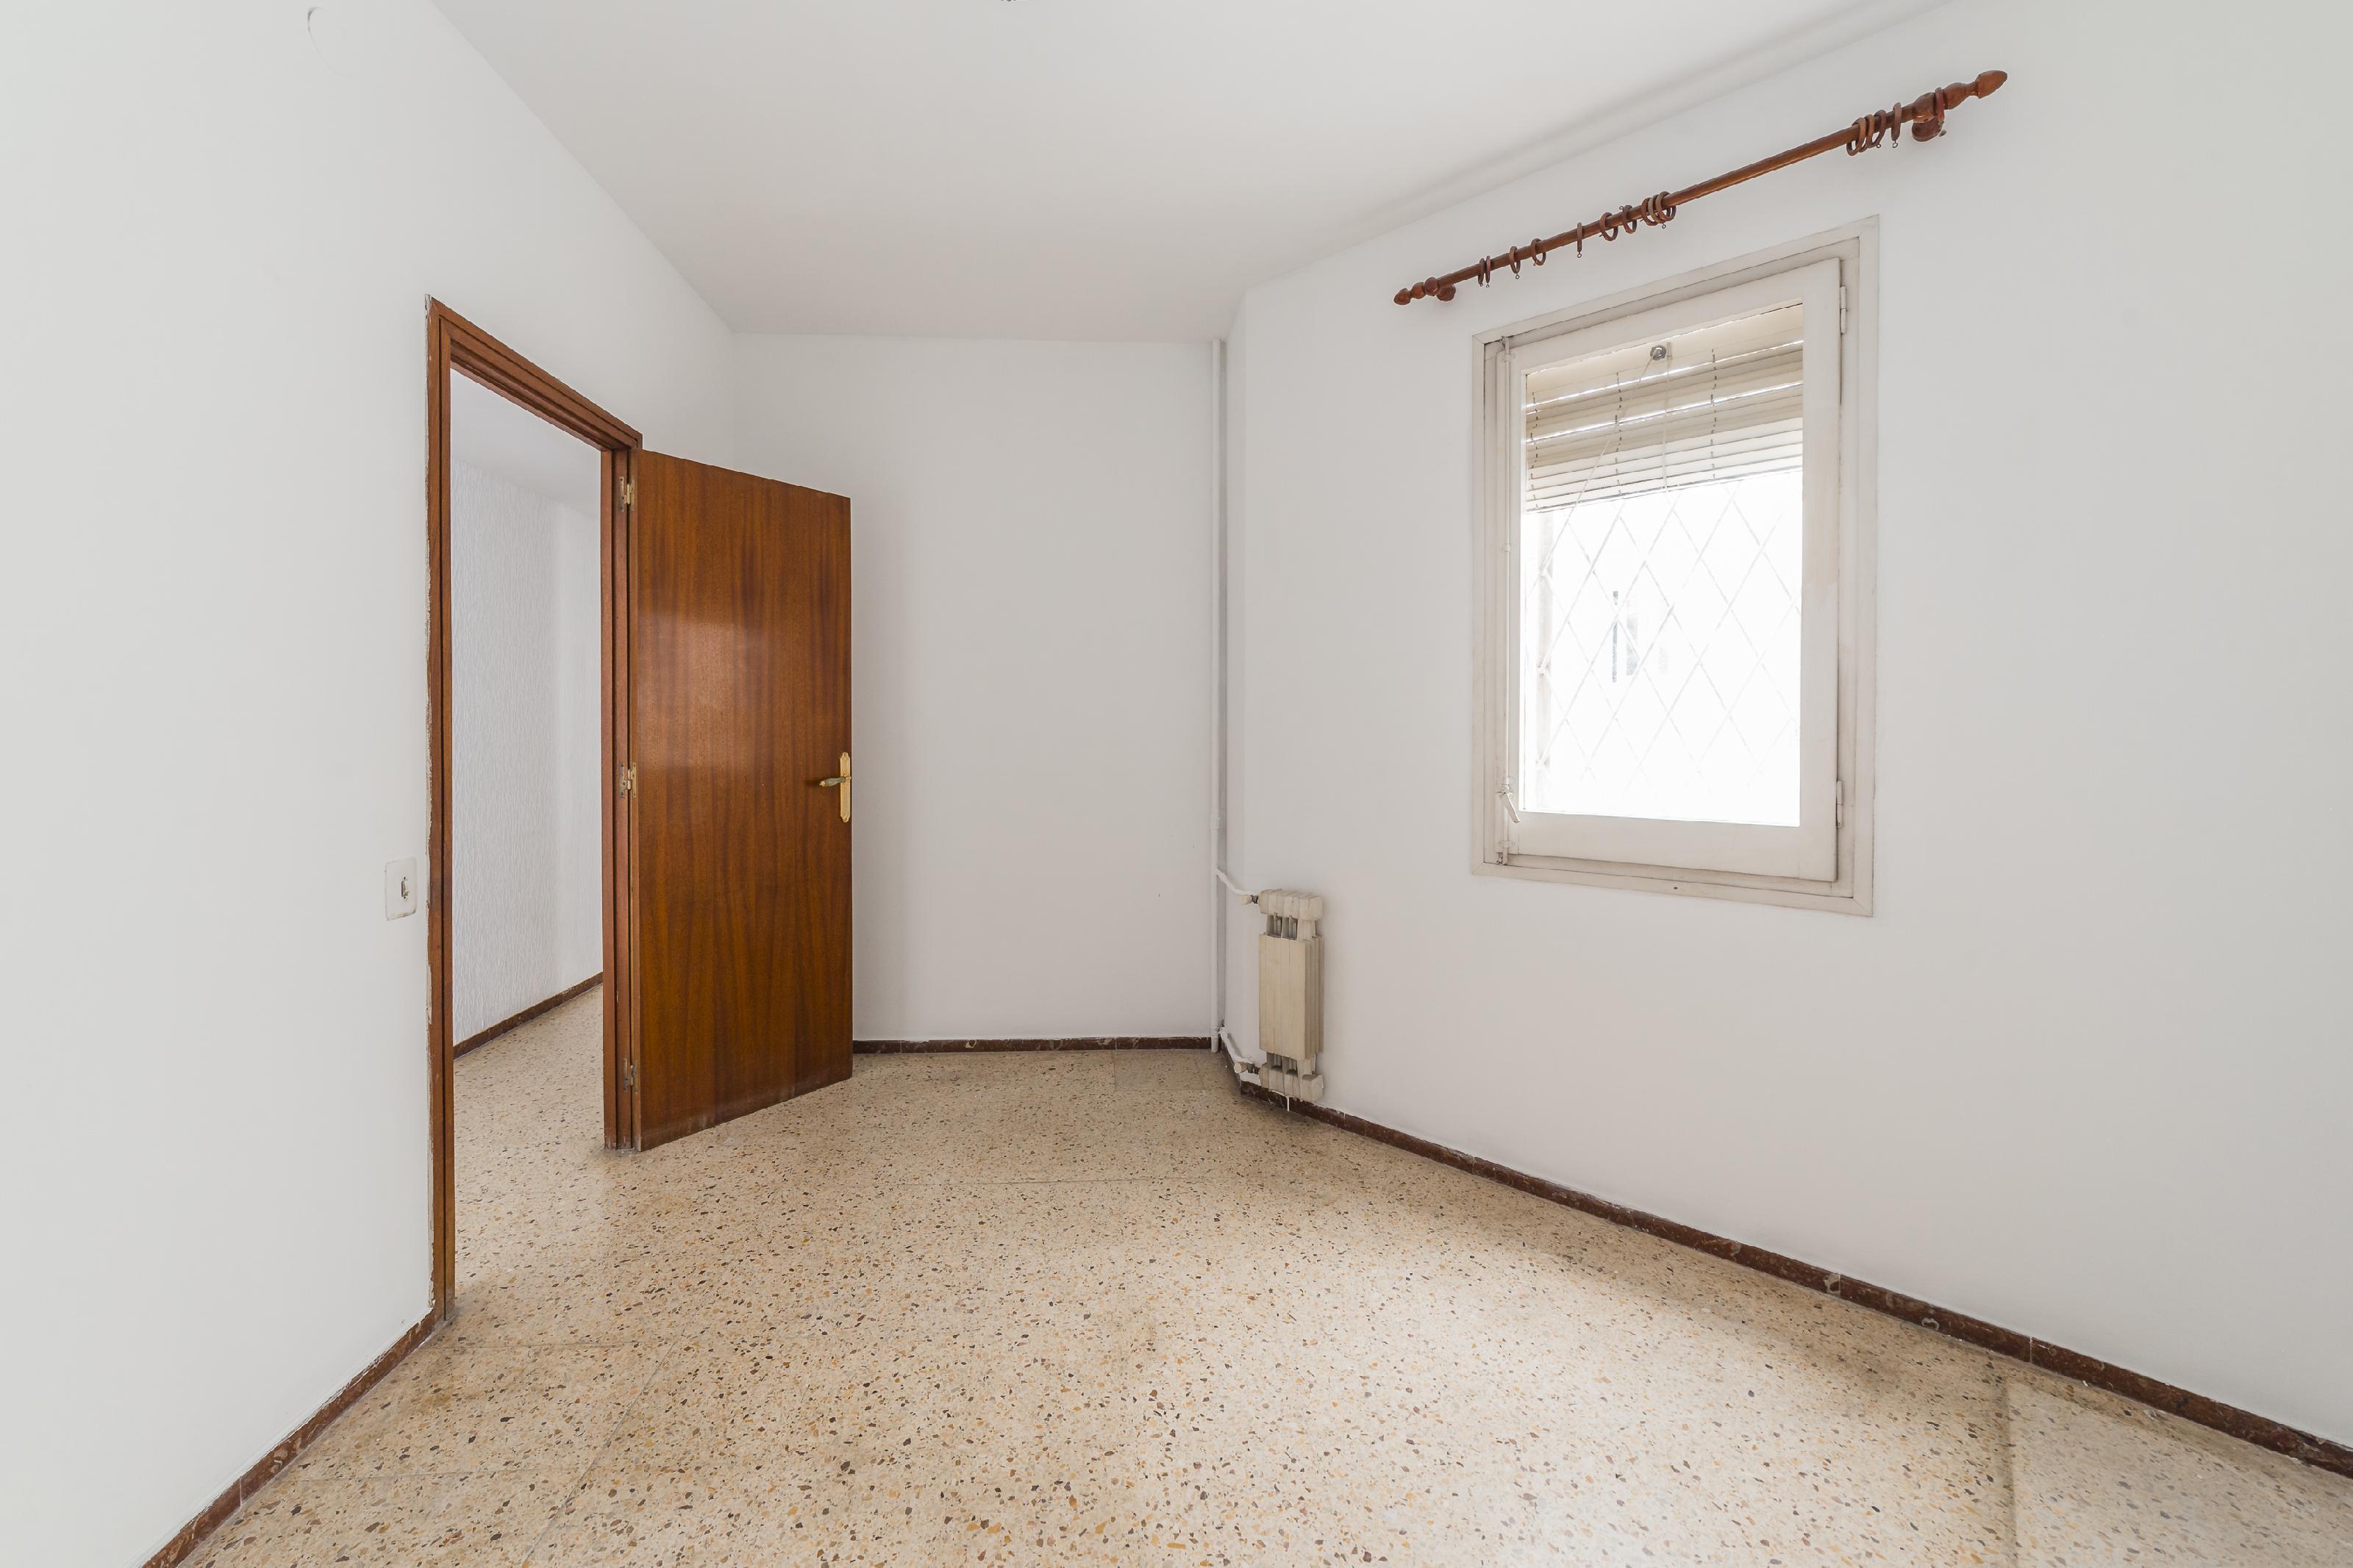 247624 Flat for sale in Eixample, Sant Antoni 17